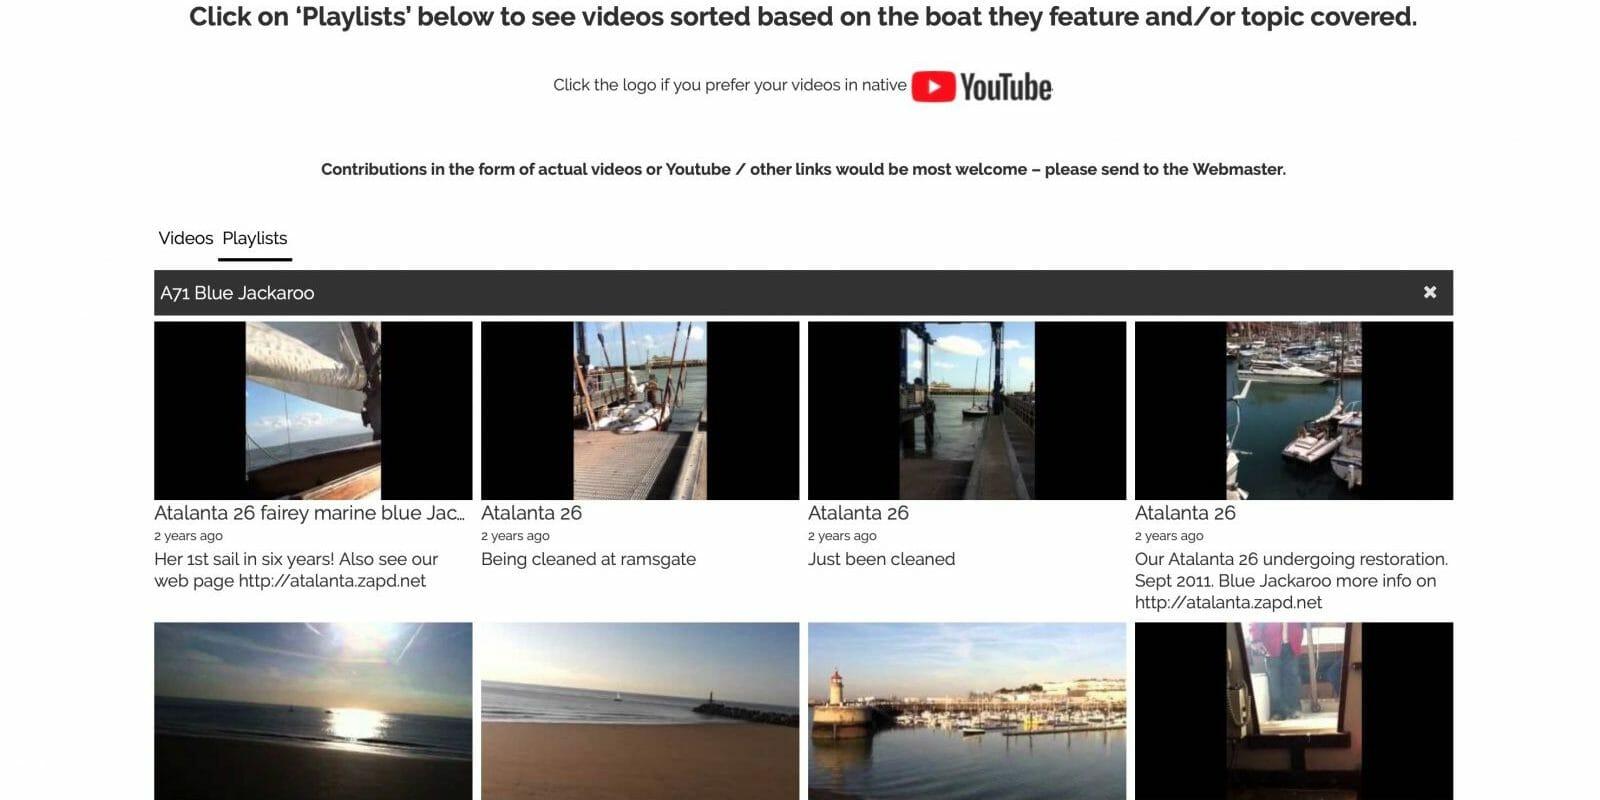 A71 Blue Jackaroo Youtube Playlist